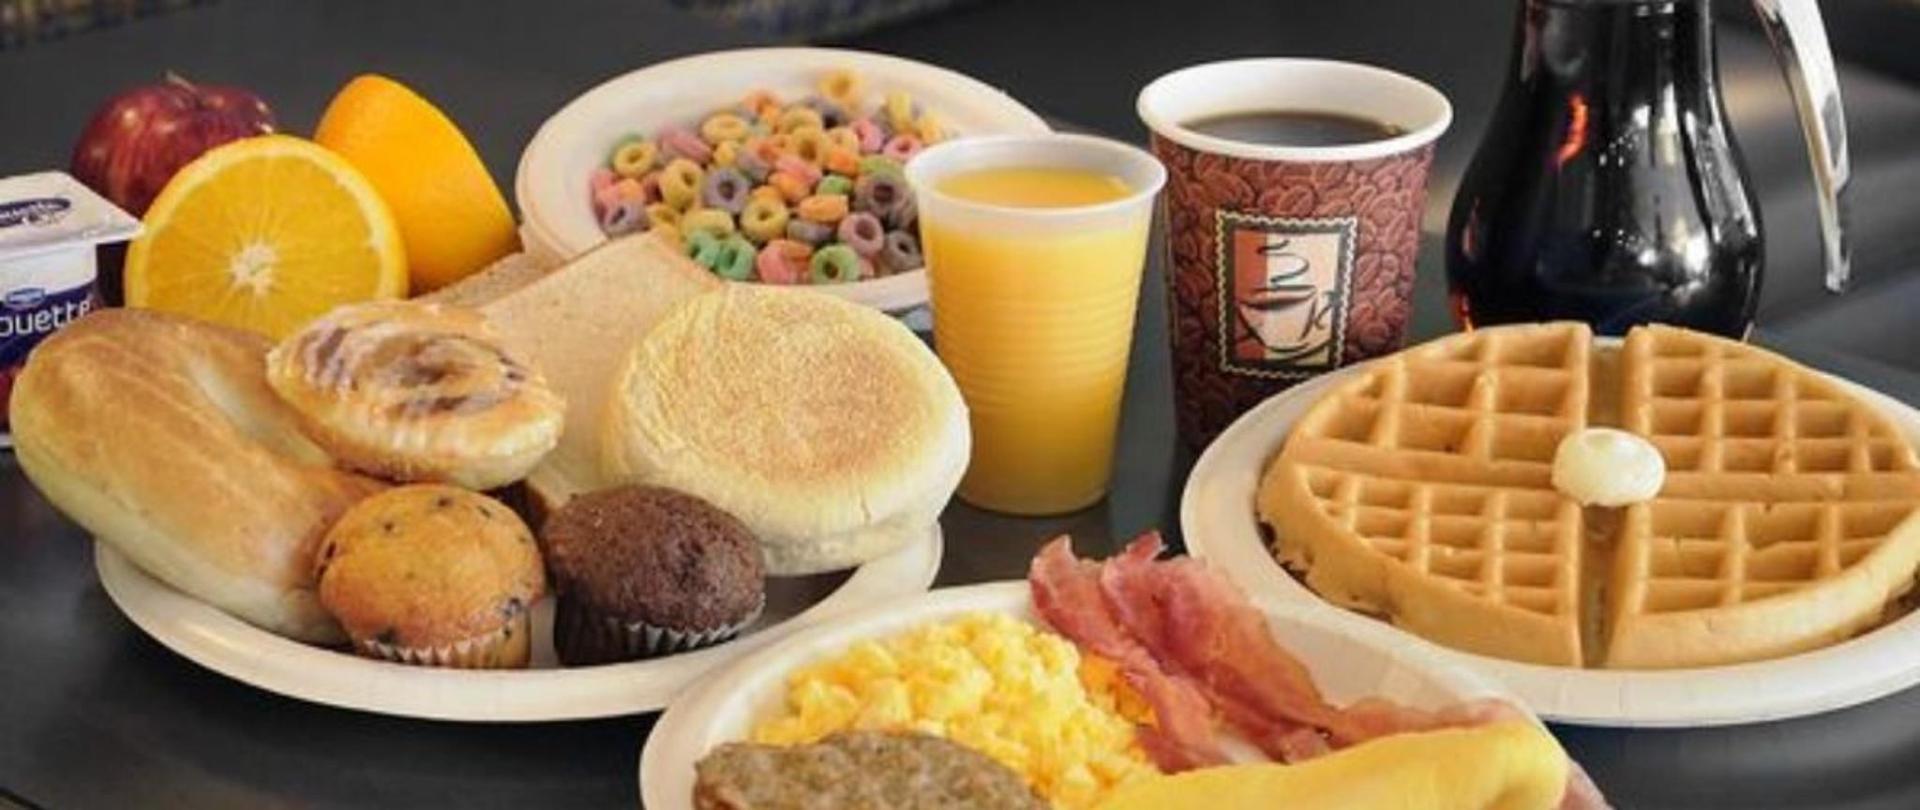 full-hot-raňajky-available-daily1_jpg_.jpg